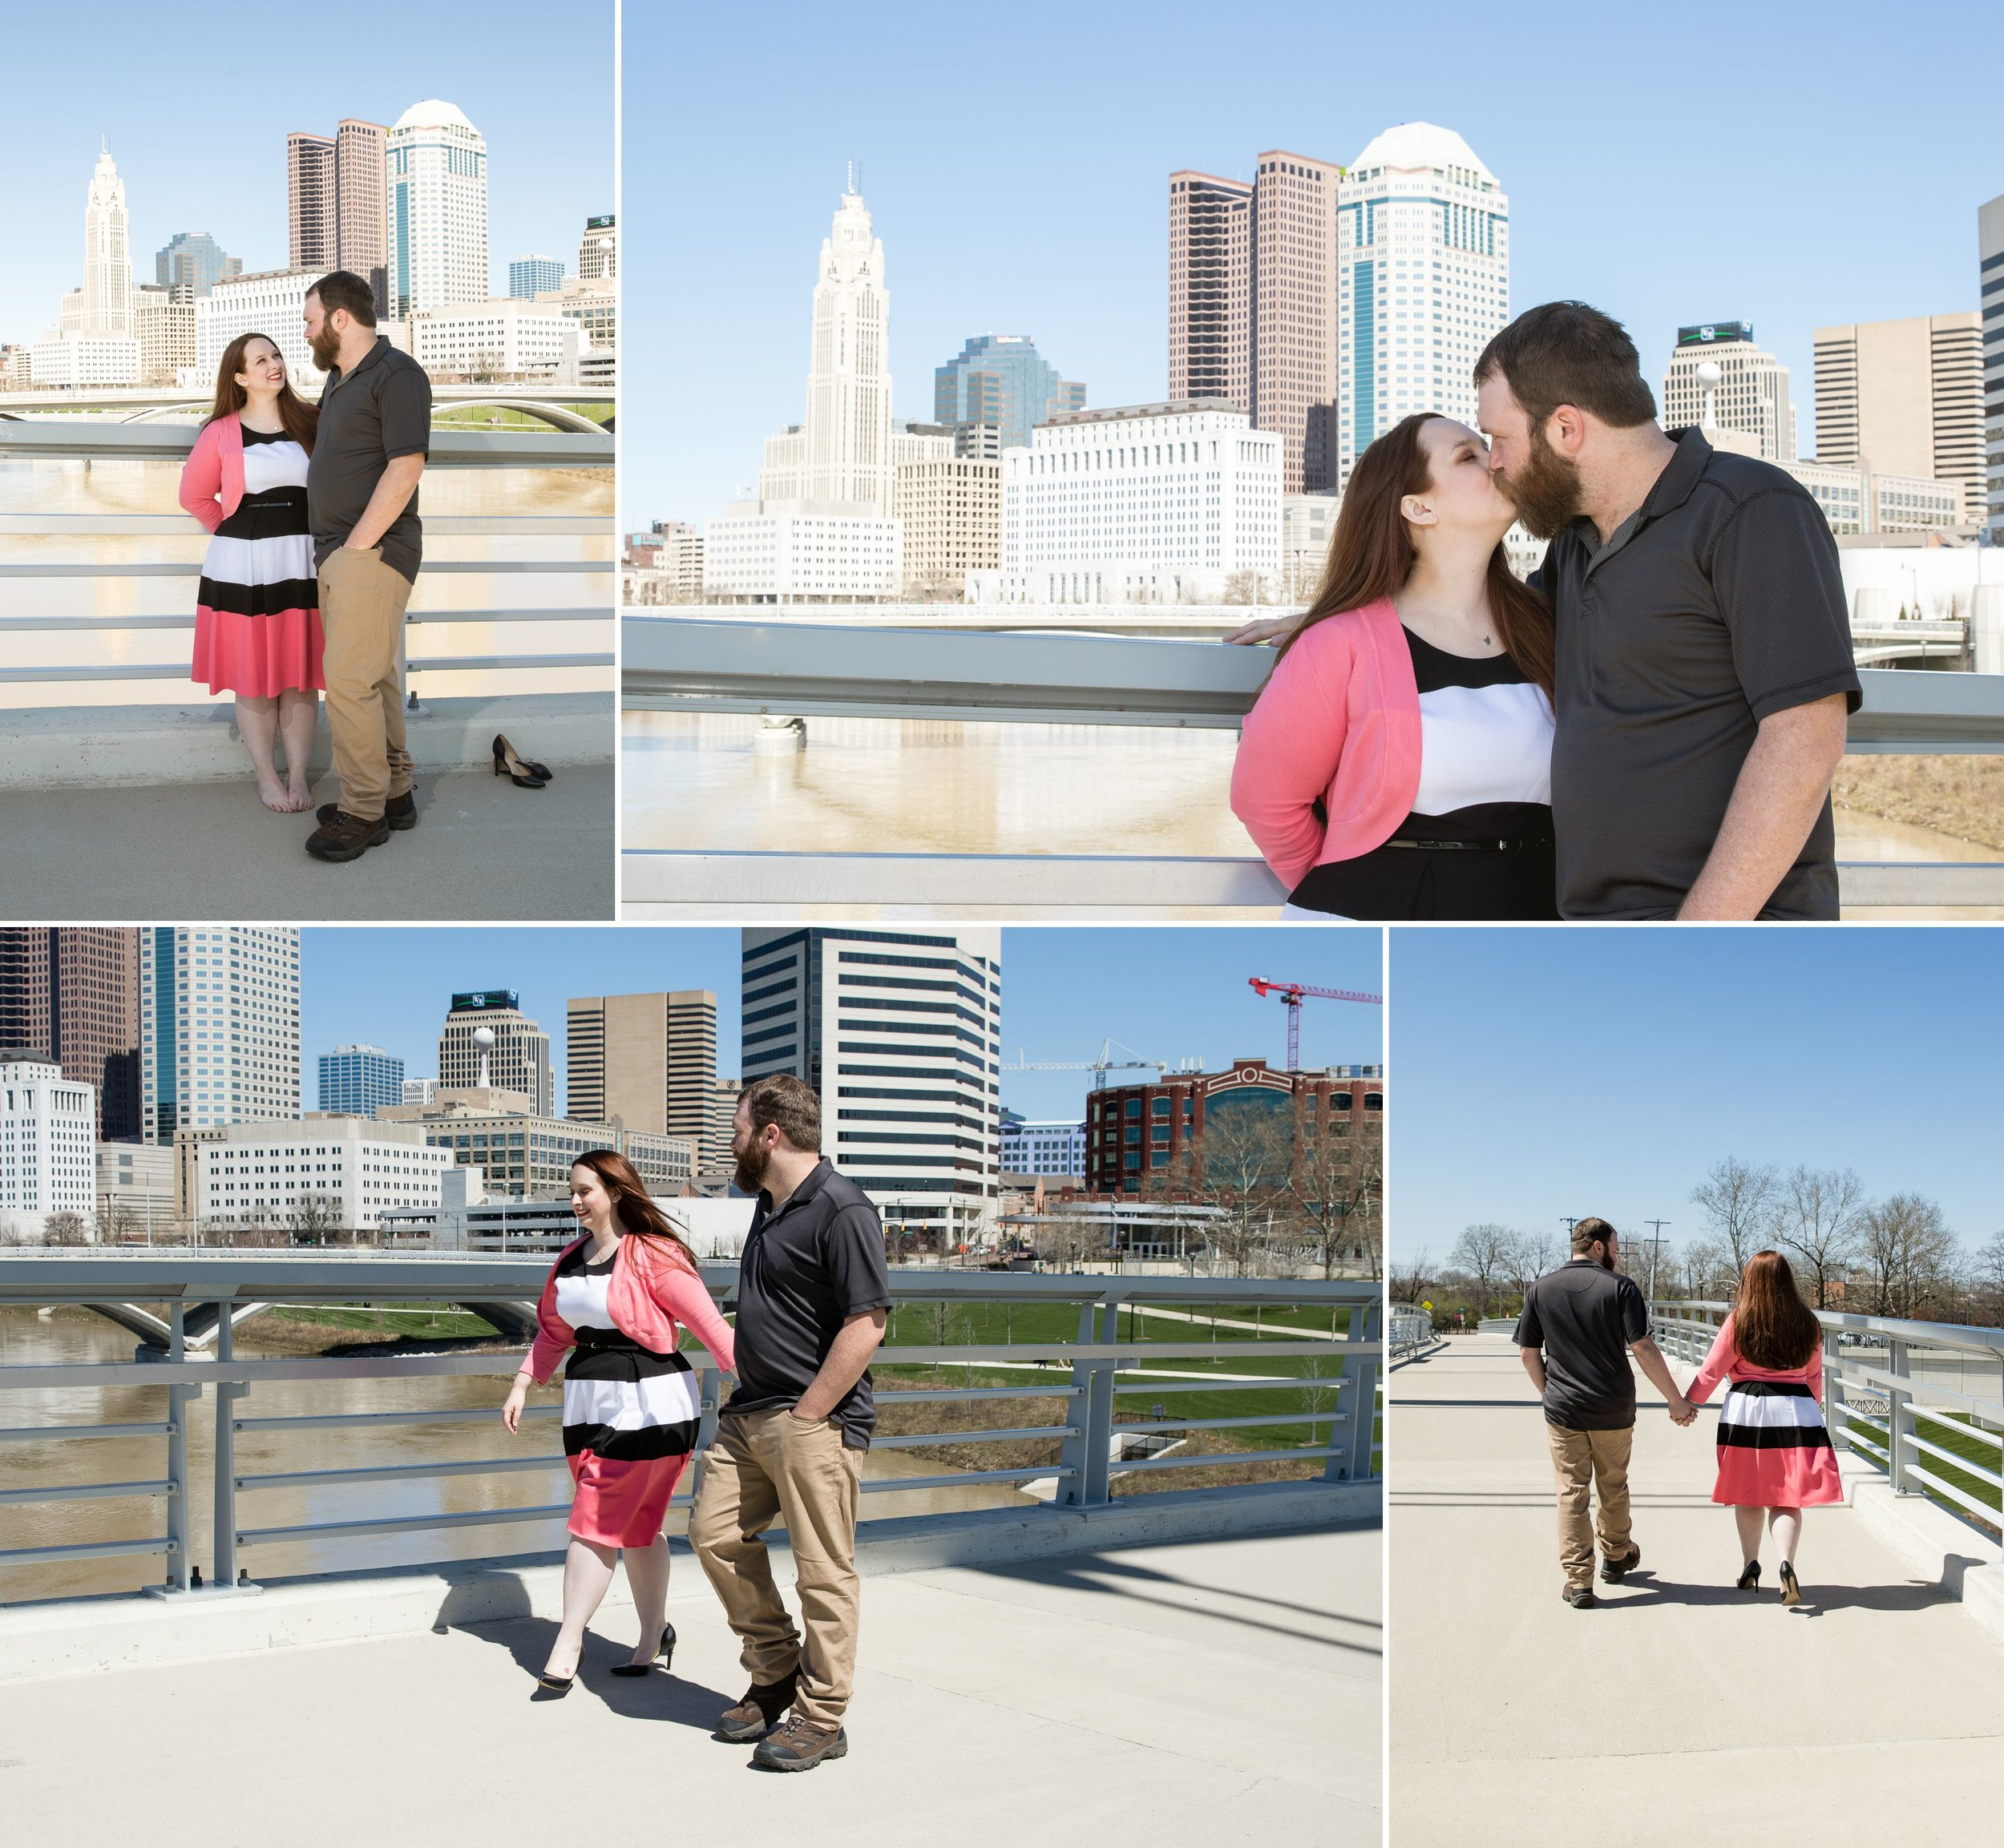 Downtown-Columbus-Ohio-Engagement-Portrait-Session-Bicentennial-Park-McFerson-Commons-Muschlitz-Photography-005.JPG